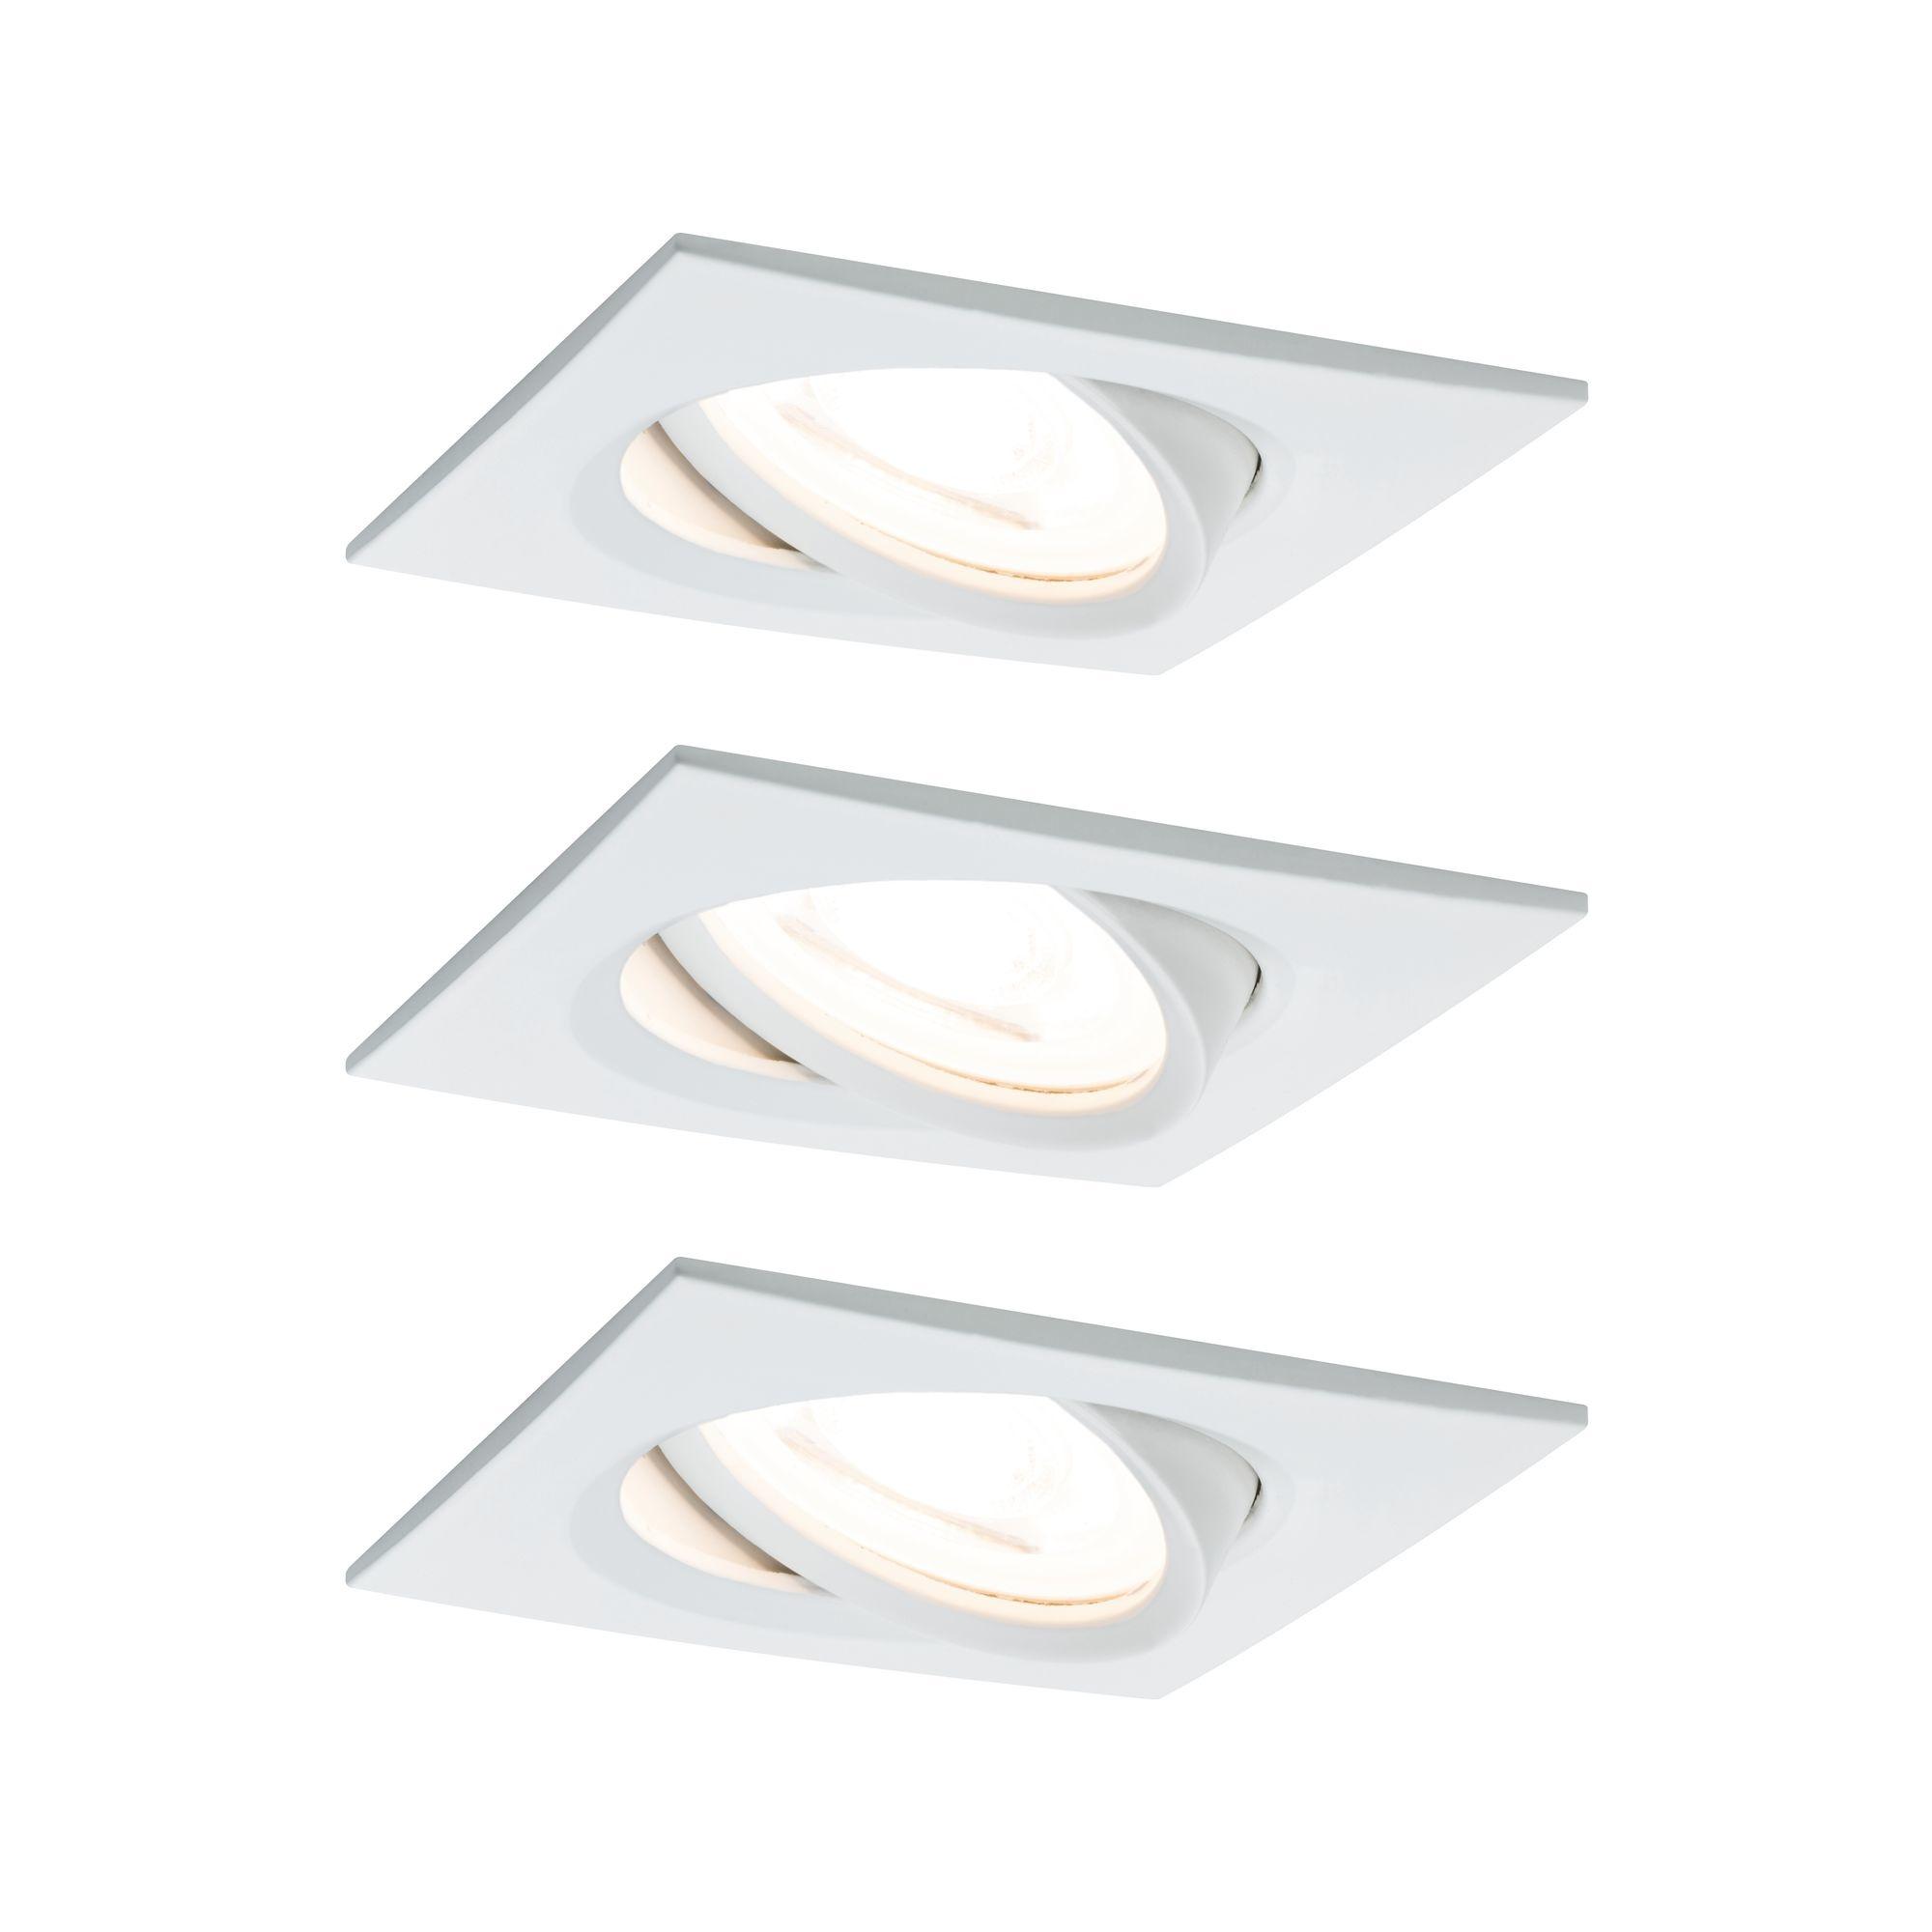 Paulmann EBL Set Nova eckig schw LED 3-stepdim3x6,5W 230V GU10 51mm Weiß matt/Alu